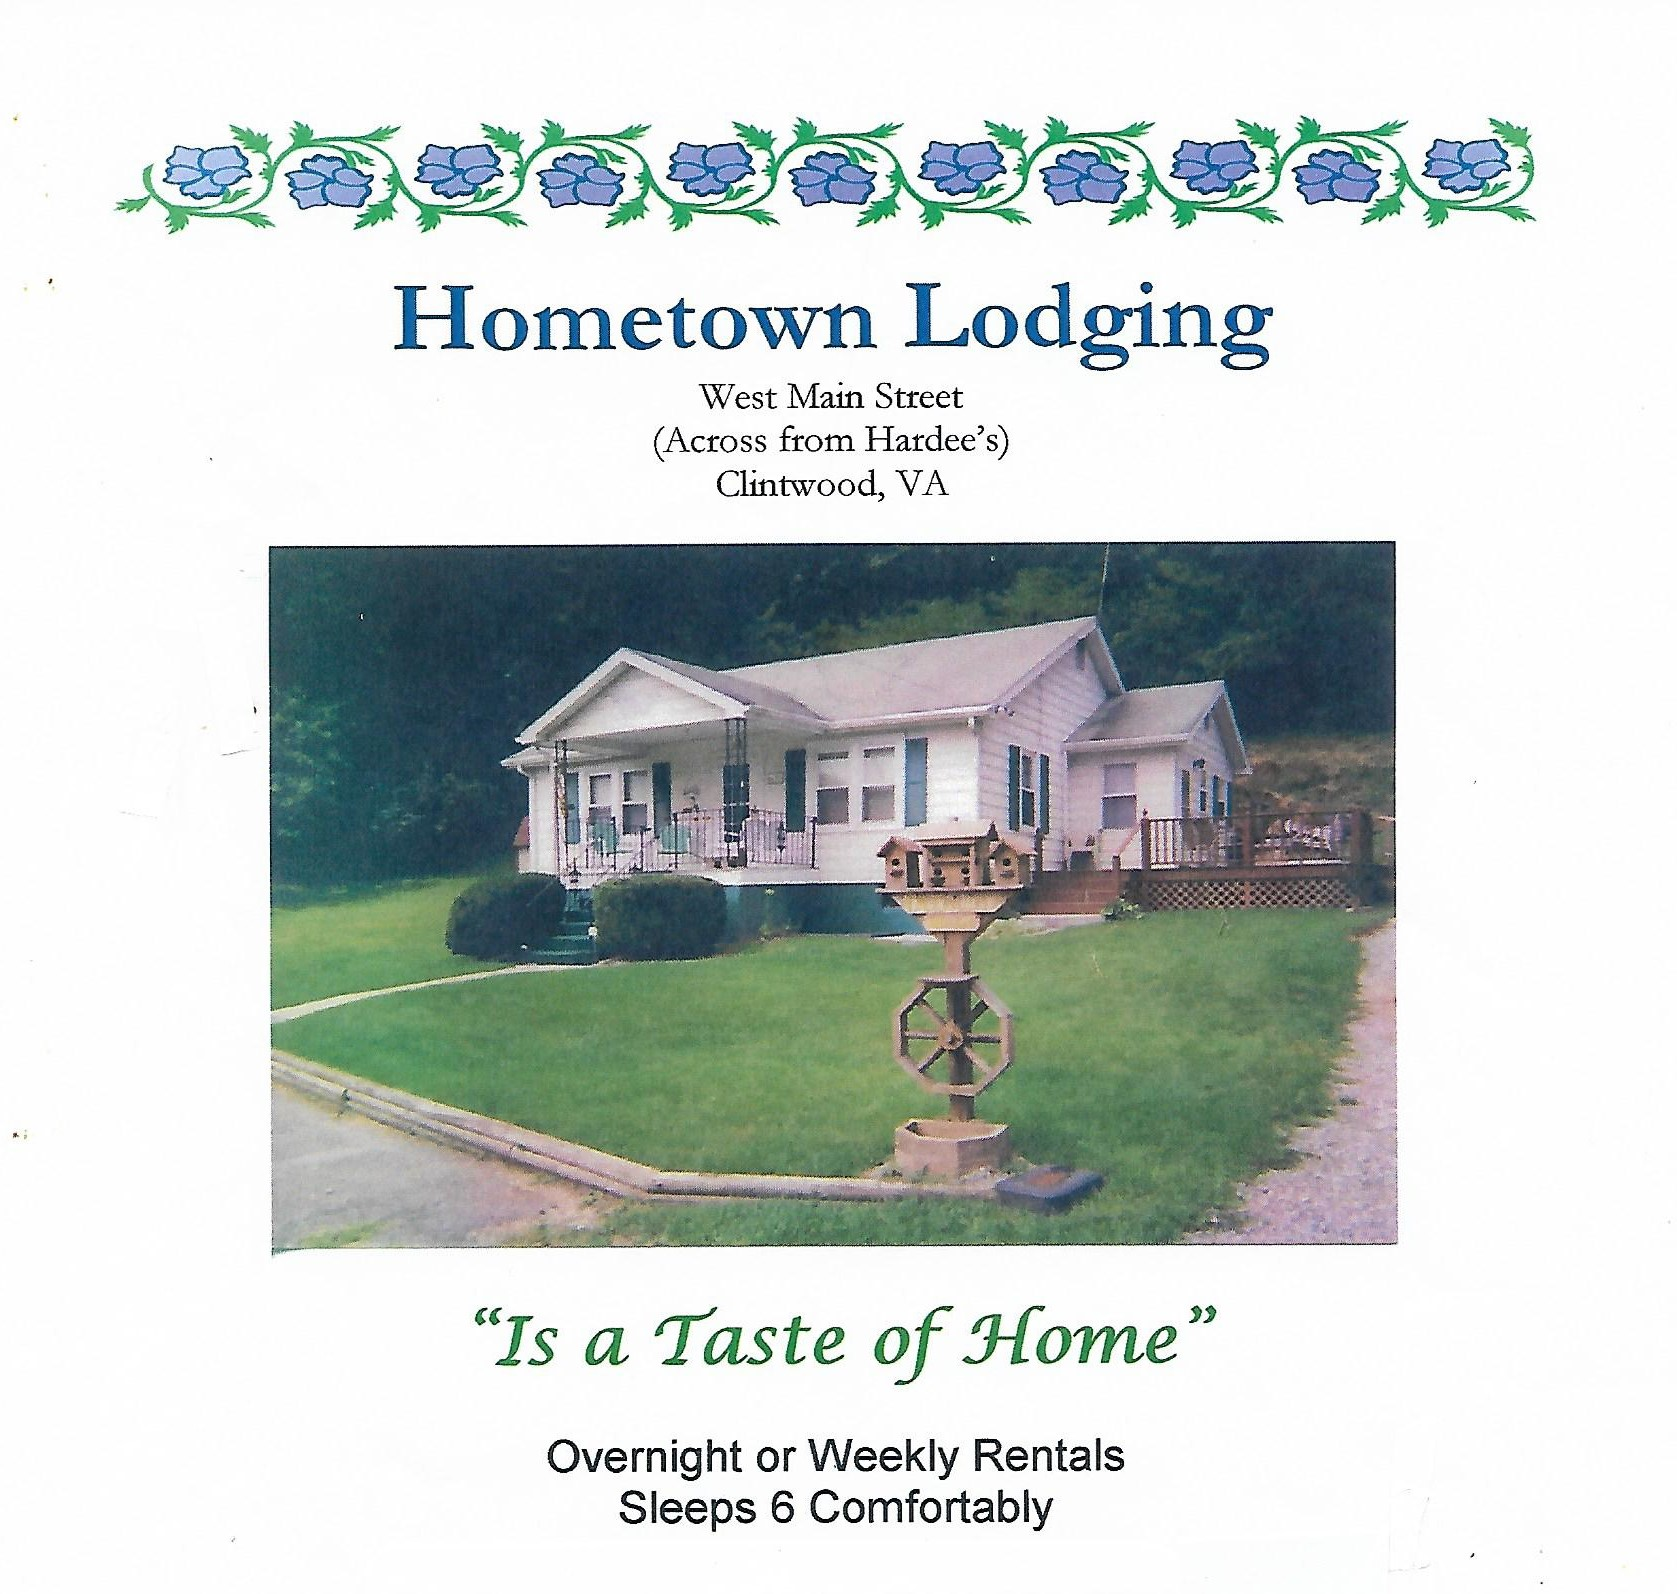 Hometown lodging2.jpg